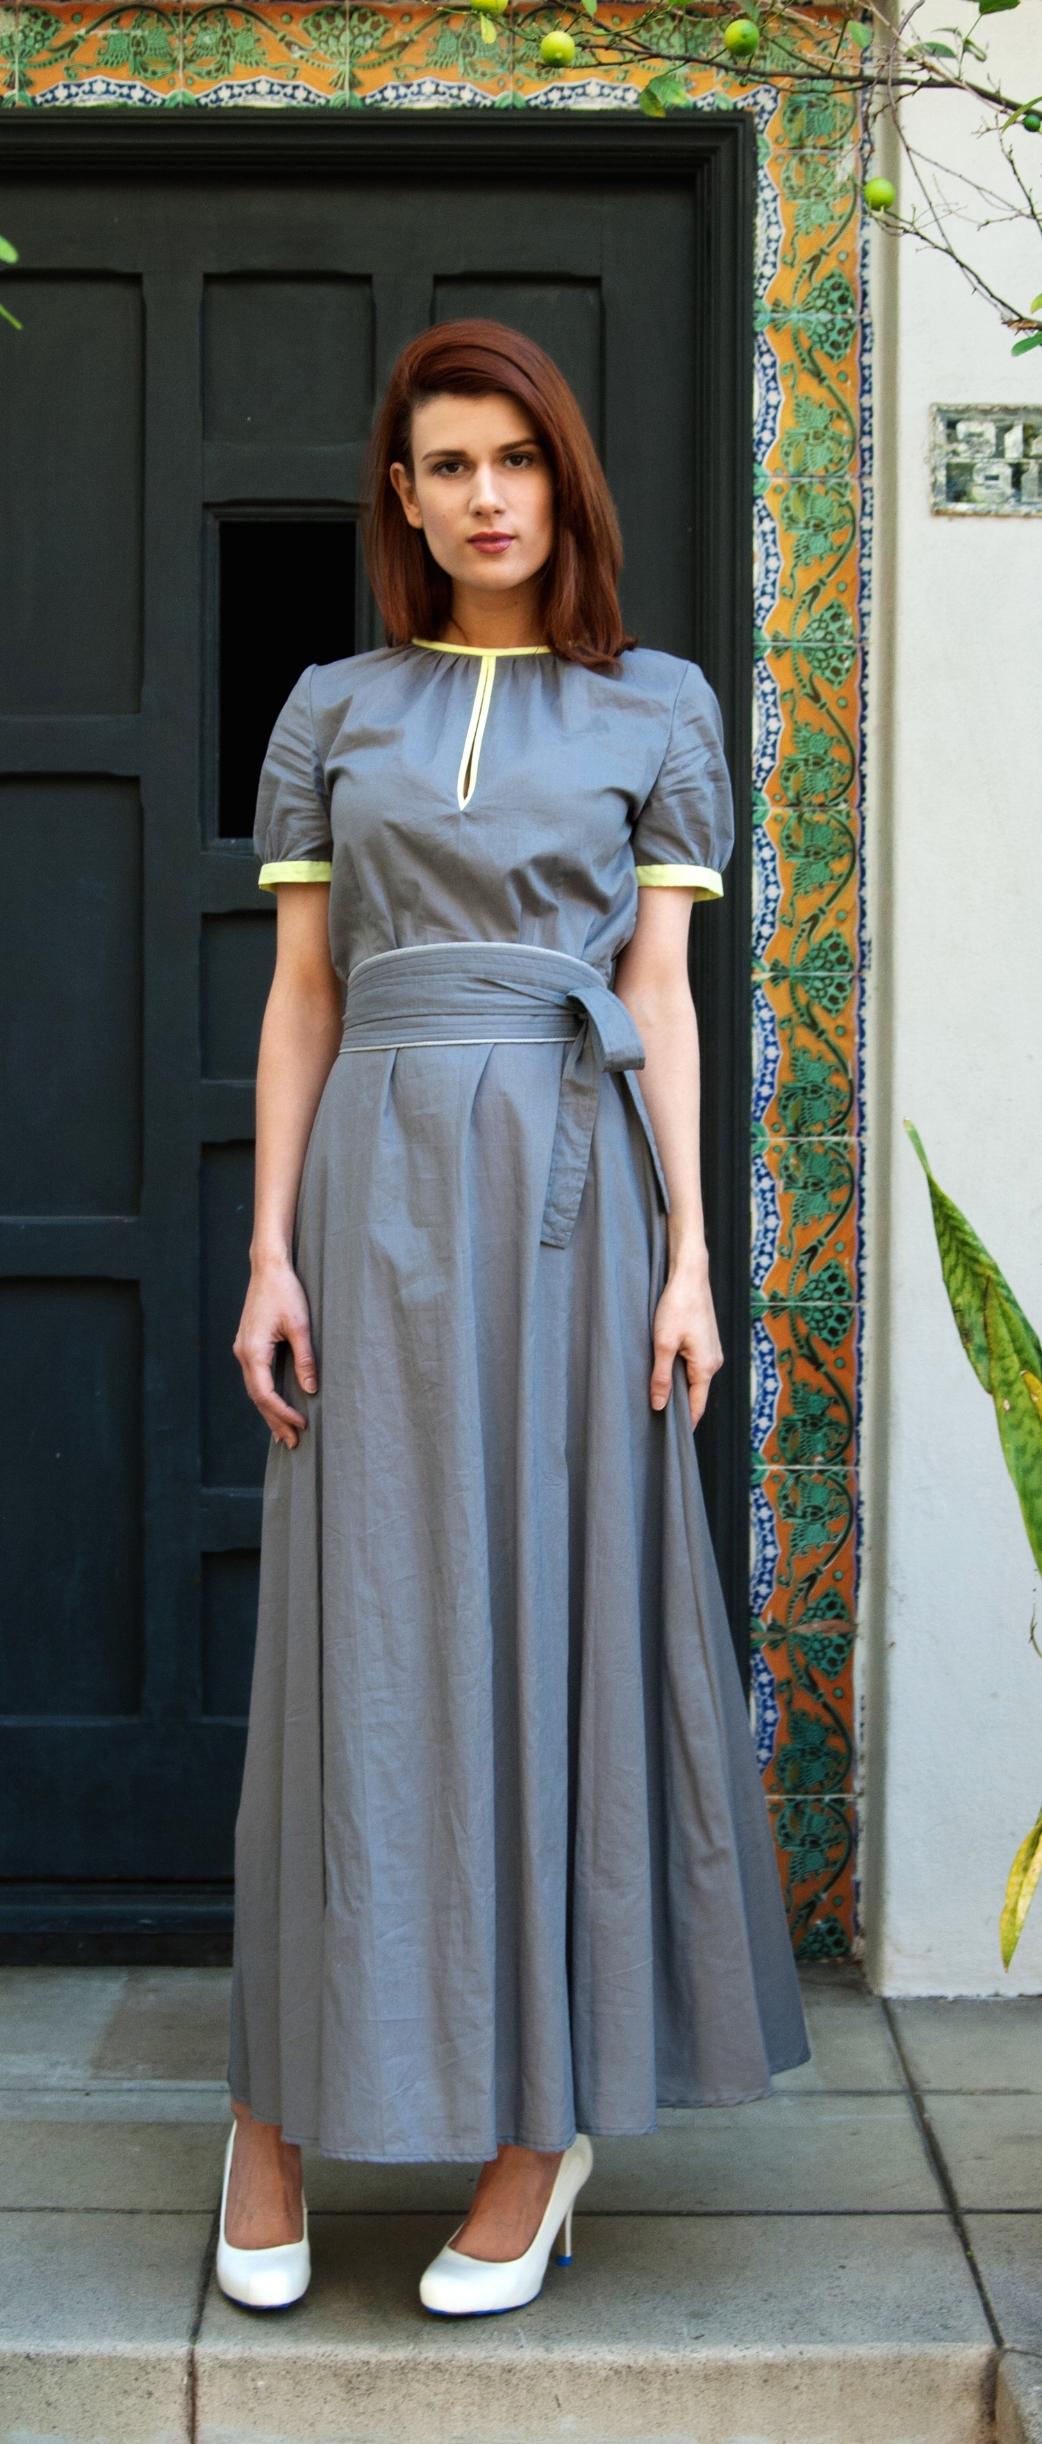 Keyhole Maxi Dress with Obi Belt